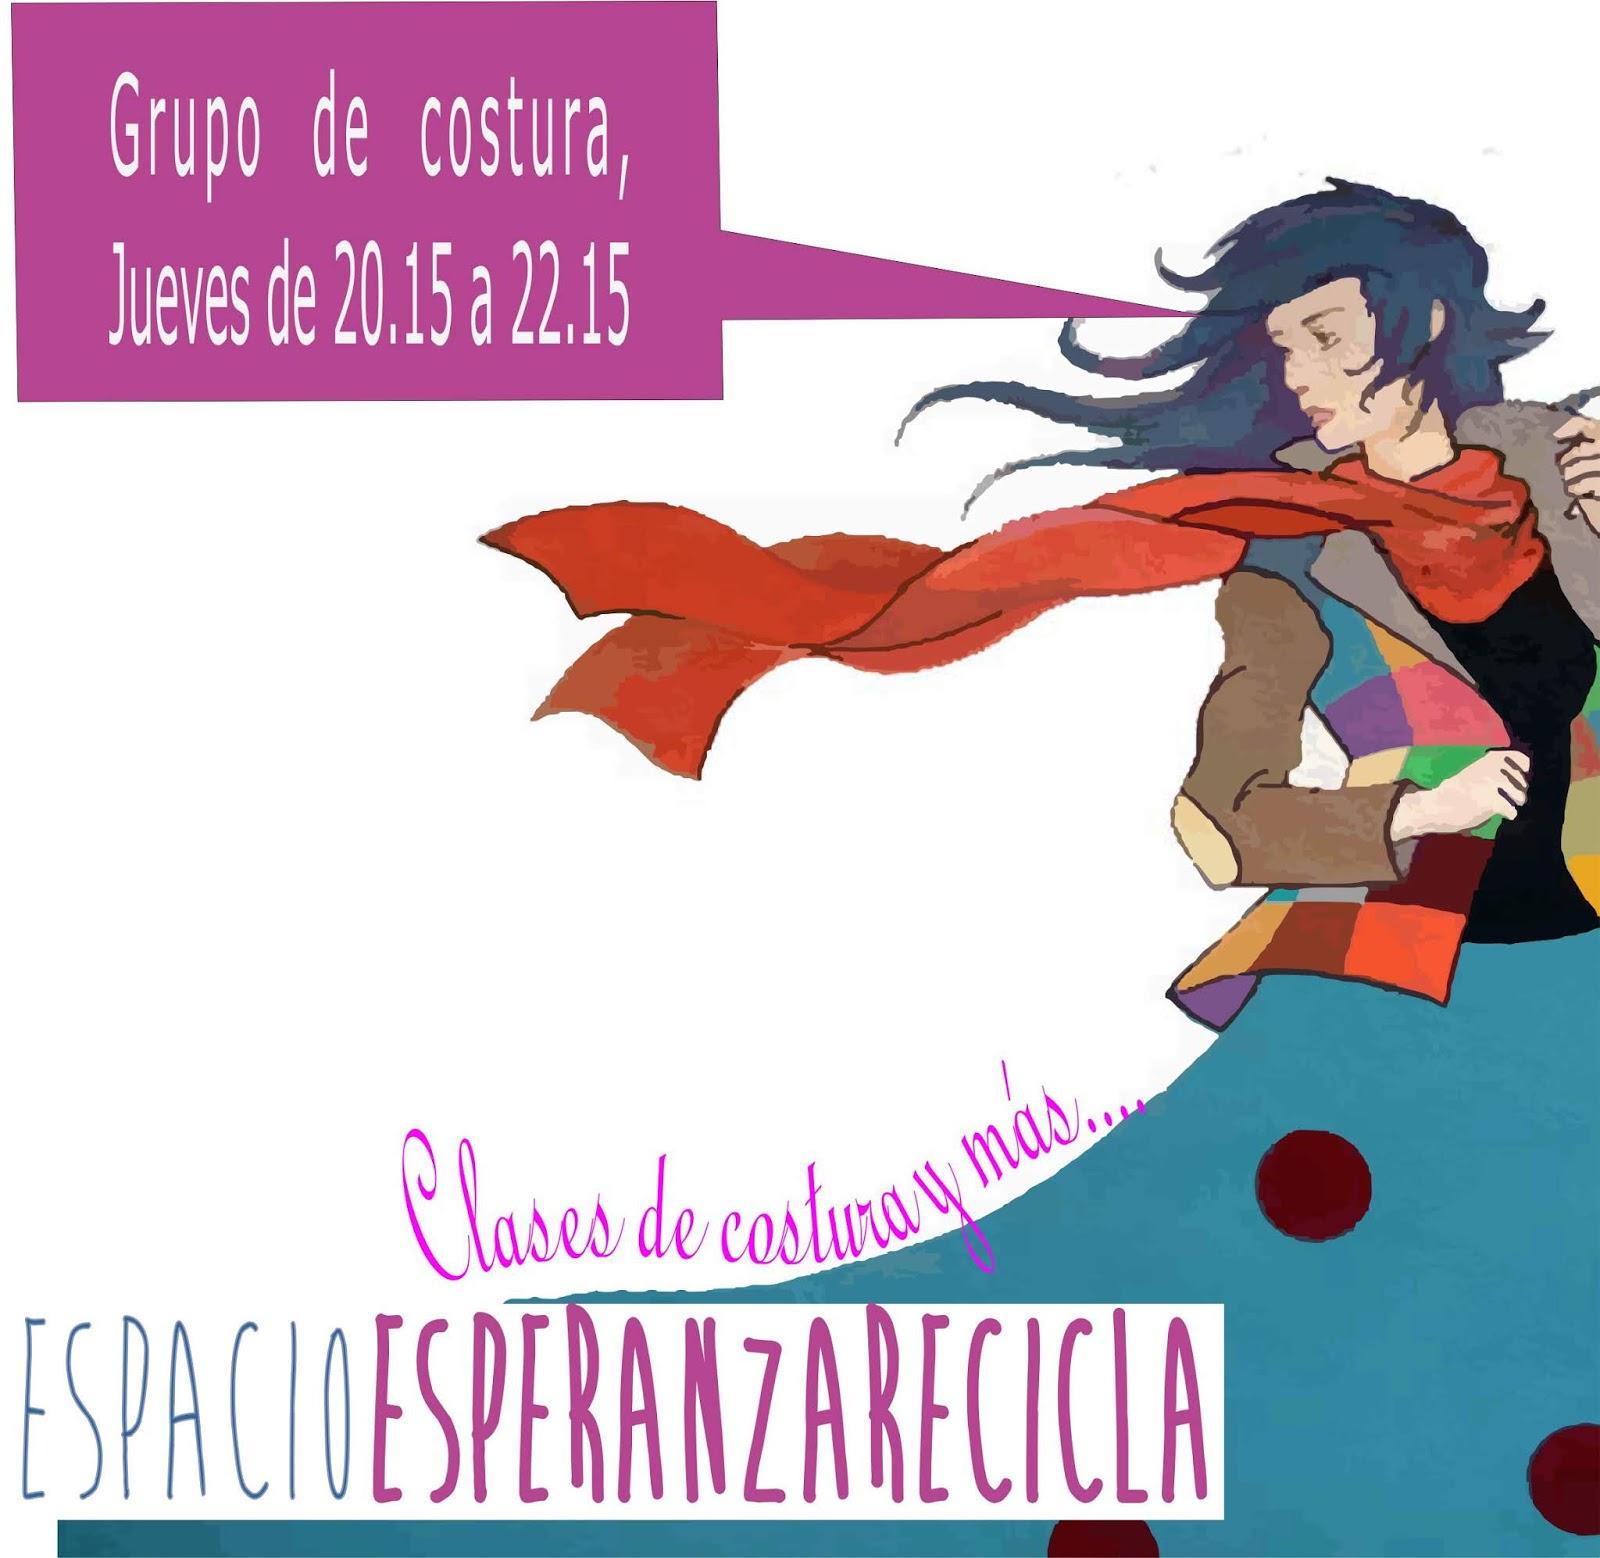 Espacio EsperanzaRecicla